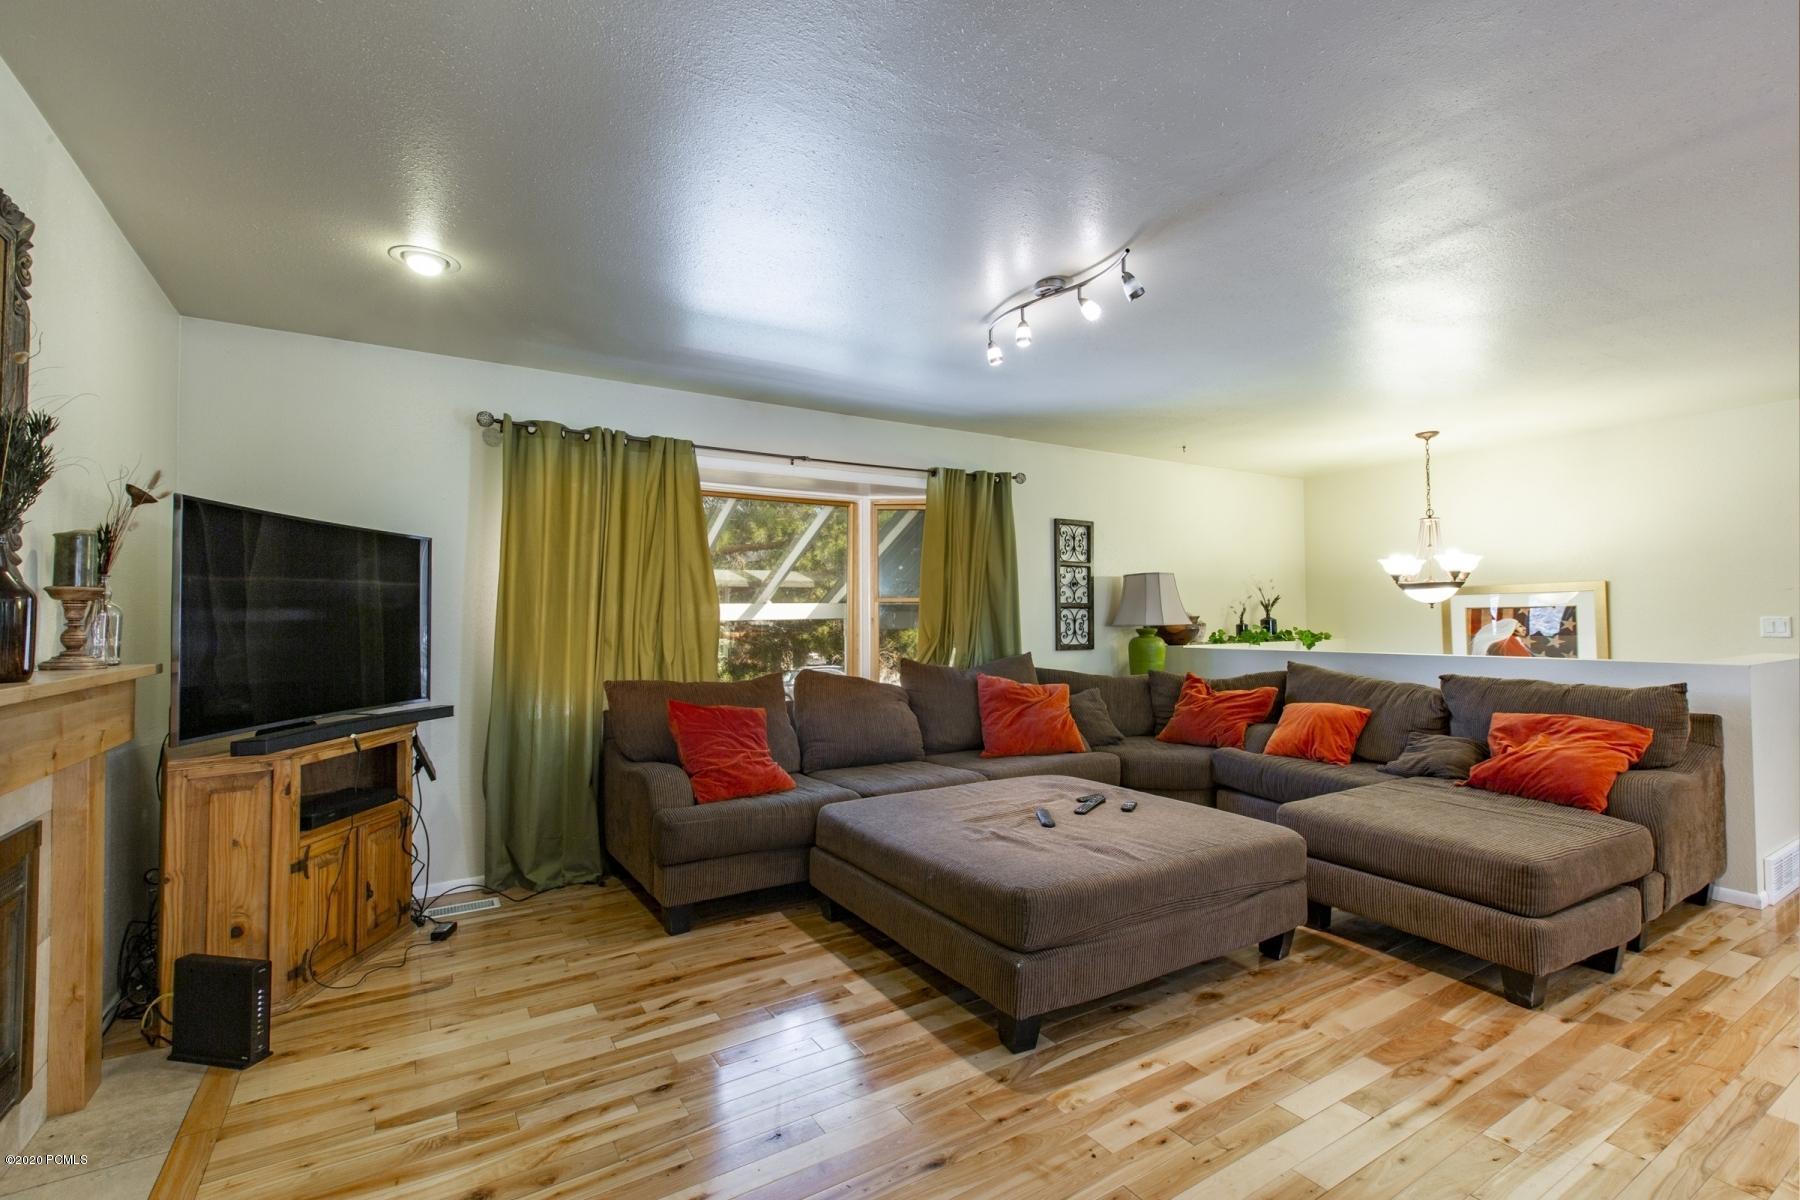 2747 Lucky John Drive, Park City, Utah 84060, 6 Bedrooms Bedrooms, ,4 BathroomsBathrooms,Single Family,For Sale,Lucky John,20190109112430415765000000